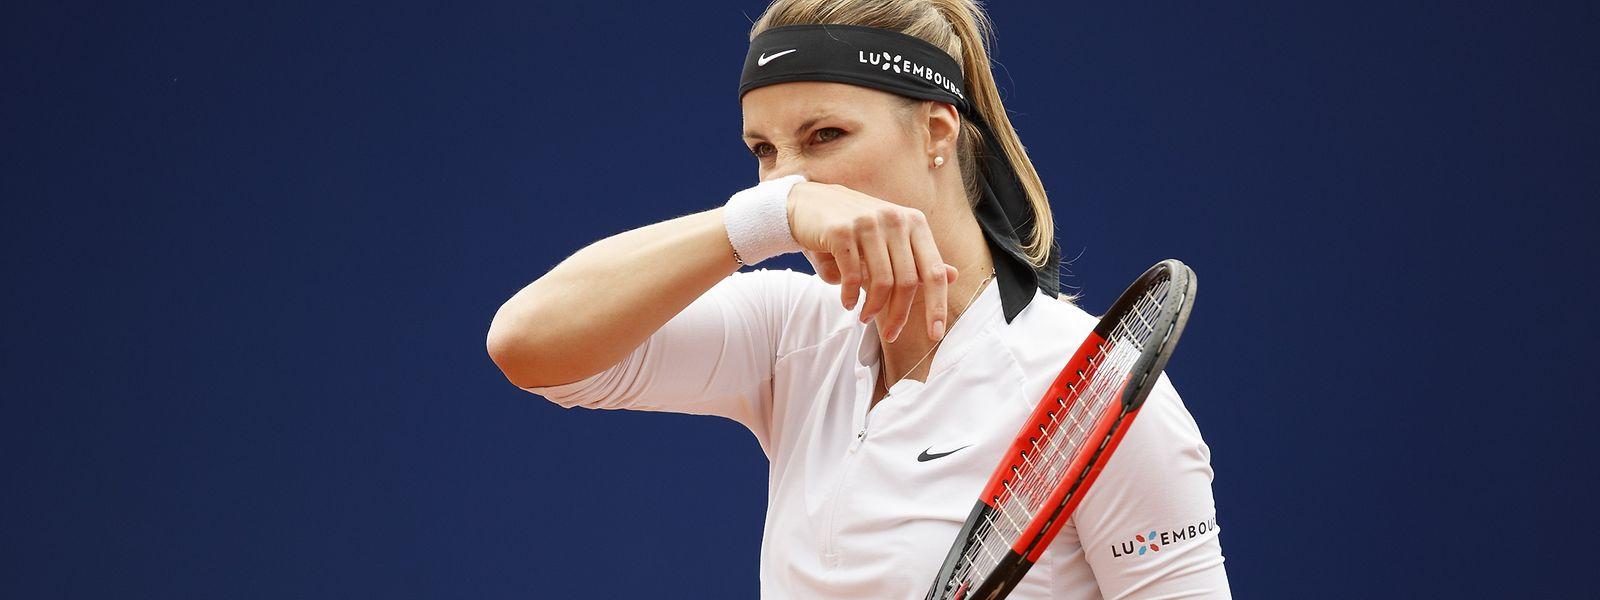 Mandy Minella kam gegen Anna Karolina Schmiedlova nicht ins Spiel.